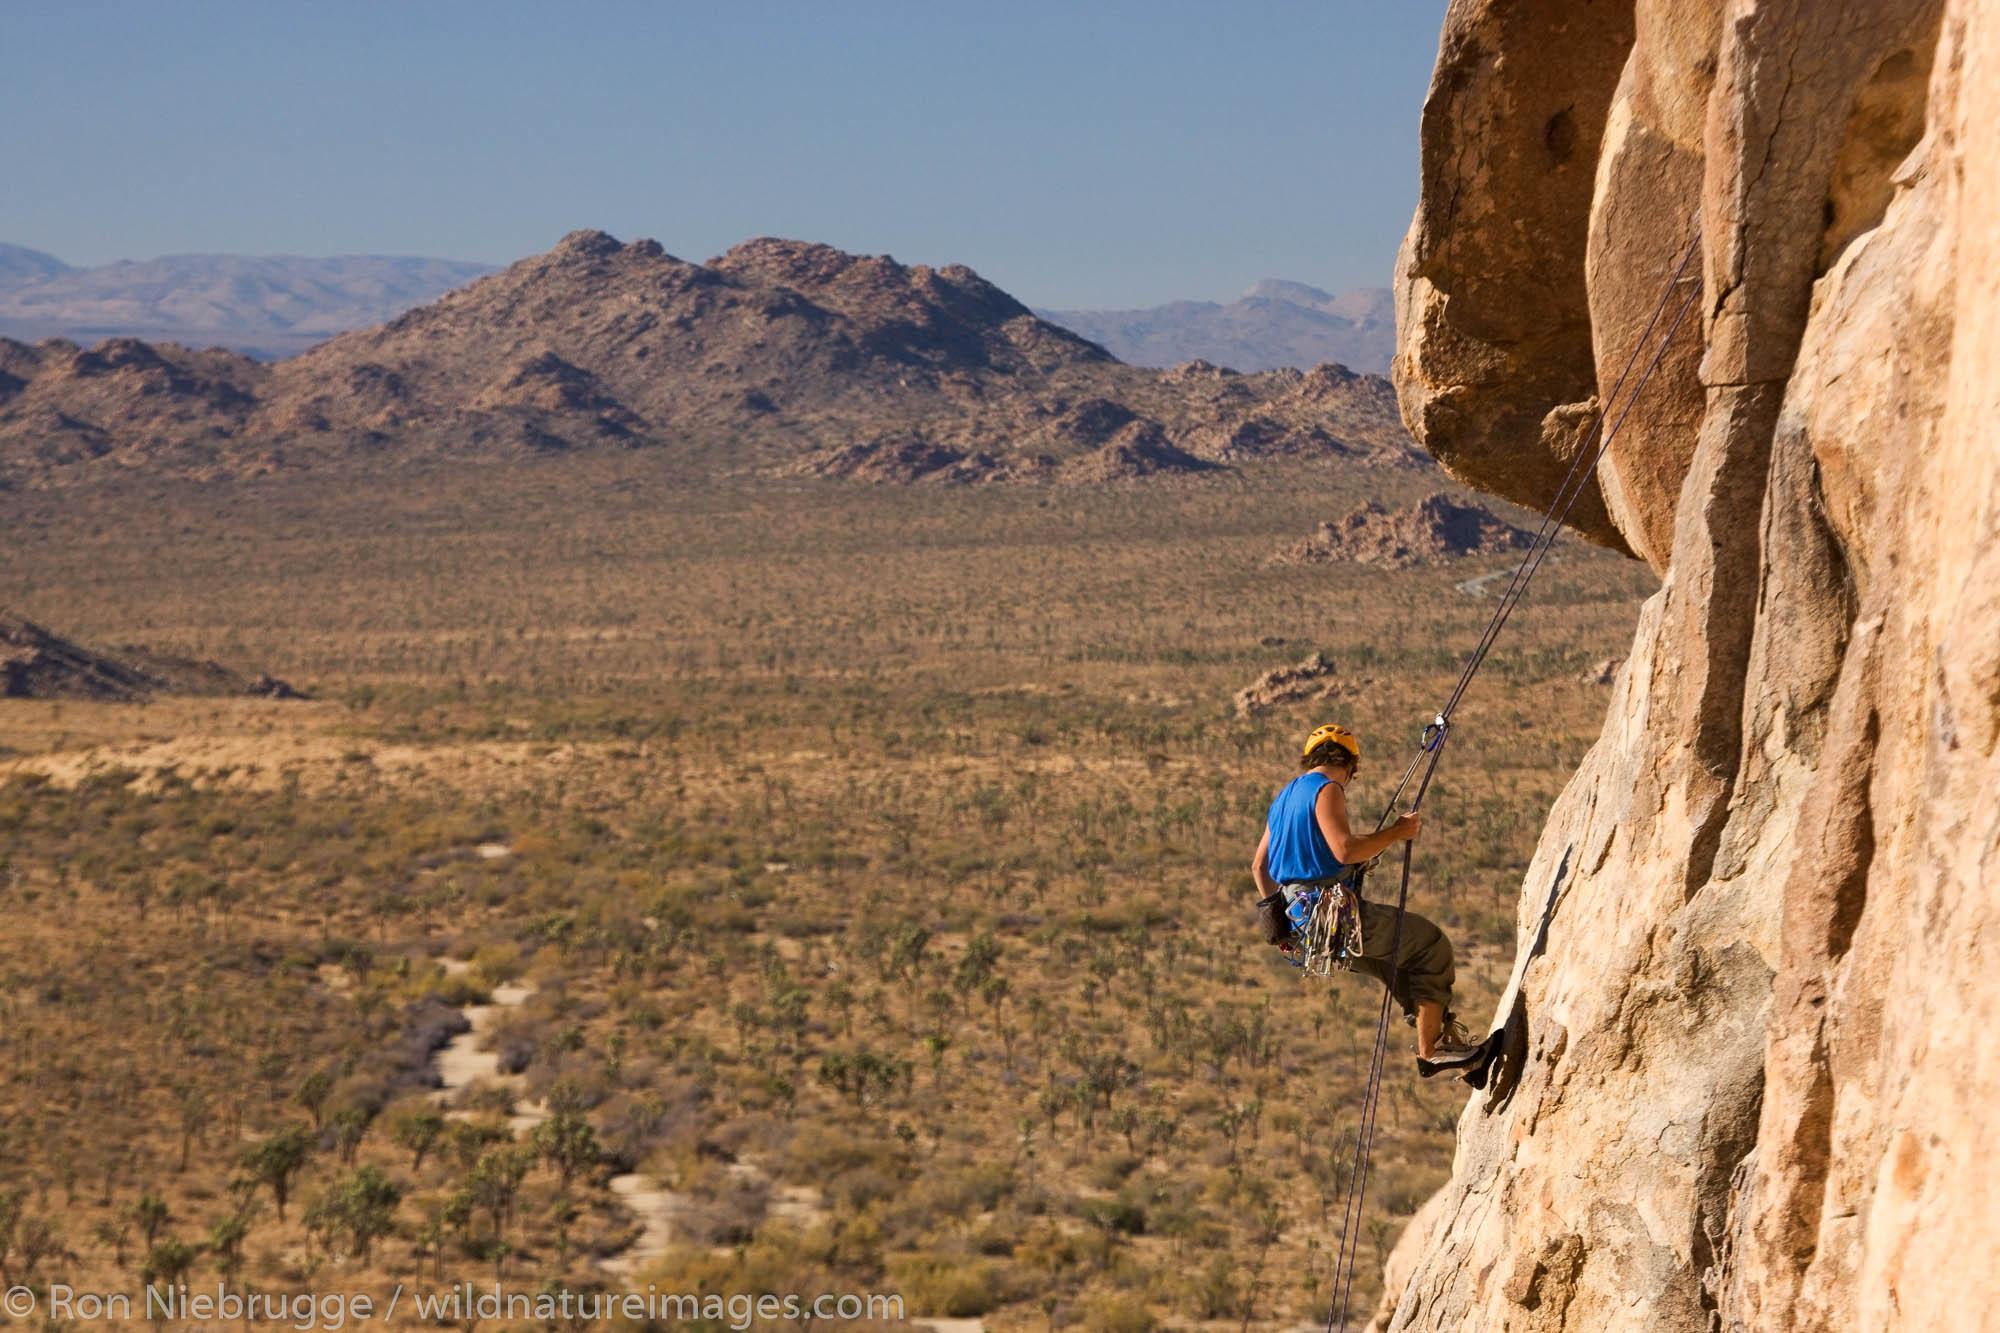 Thomas Vetsch rock climbing in Joshua Tree National Park, California.  (model released)